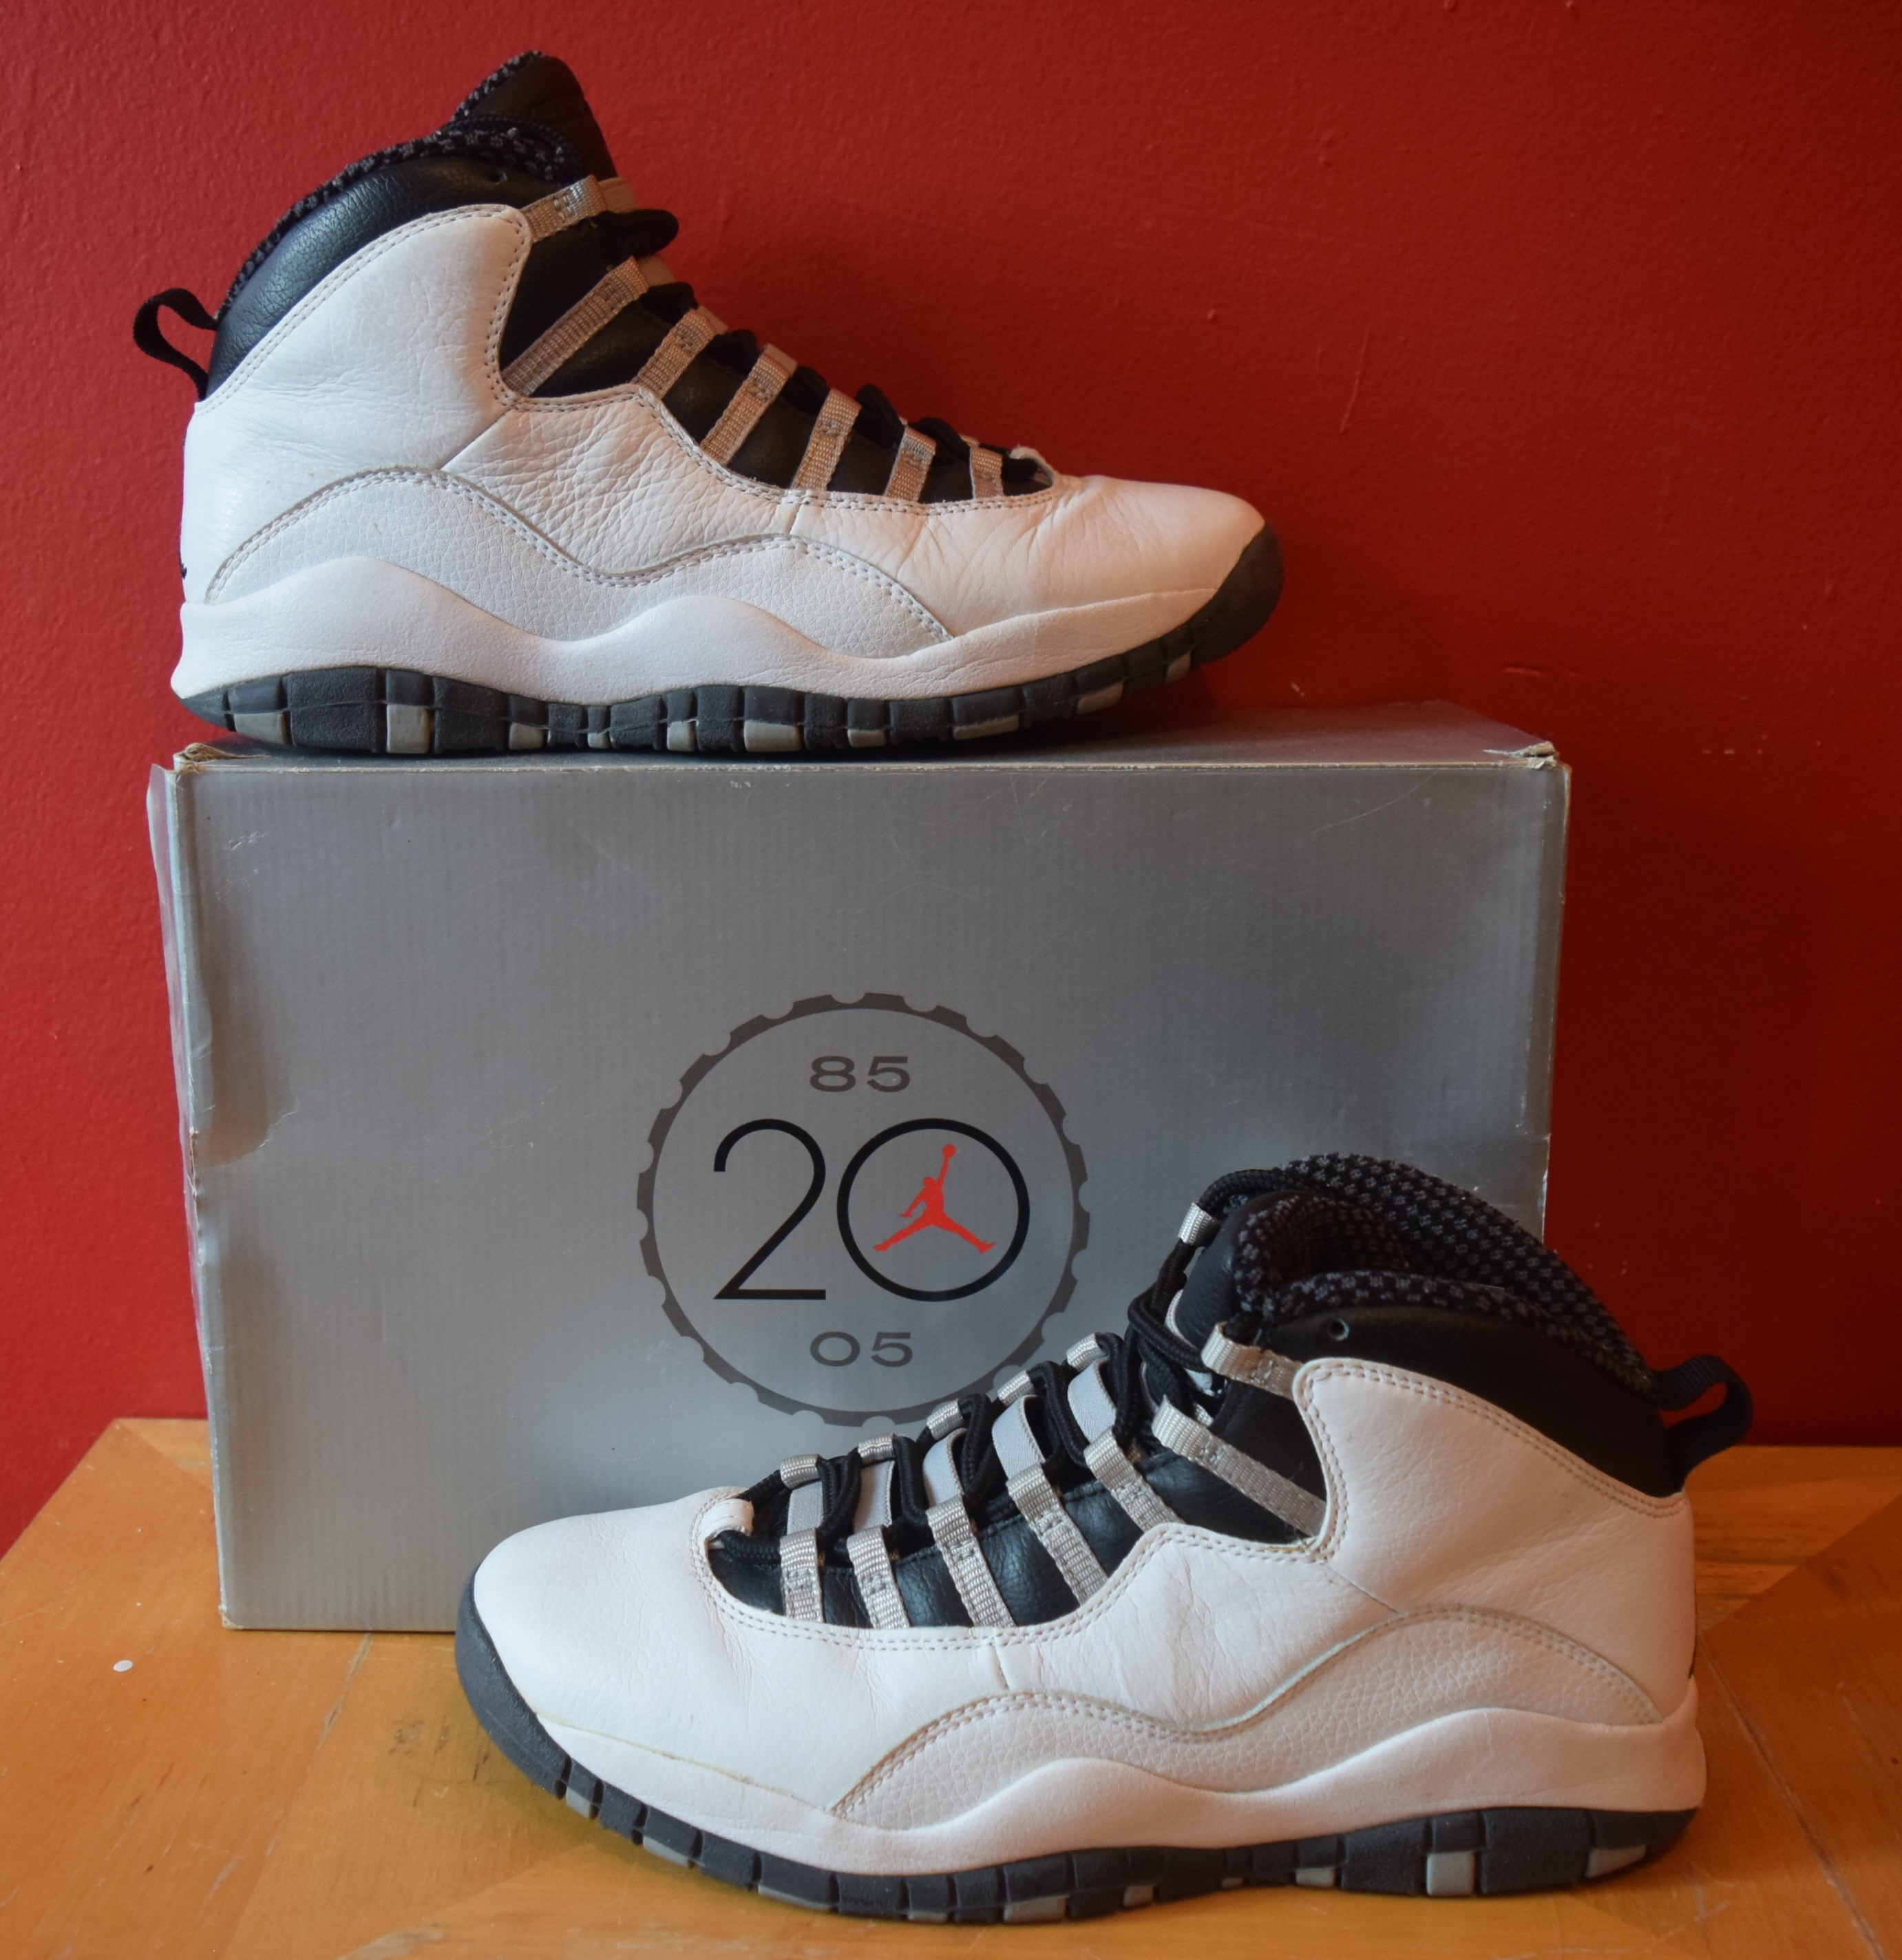 d84deb9dd84 Jordan Brand Air Jordan 10 Retro White Steel Grey Black X's Size 9 ...